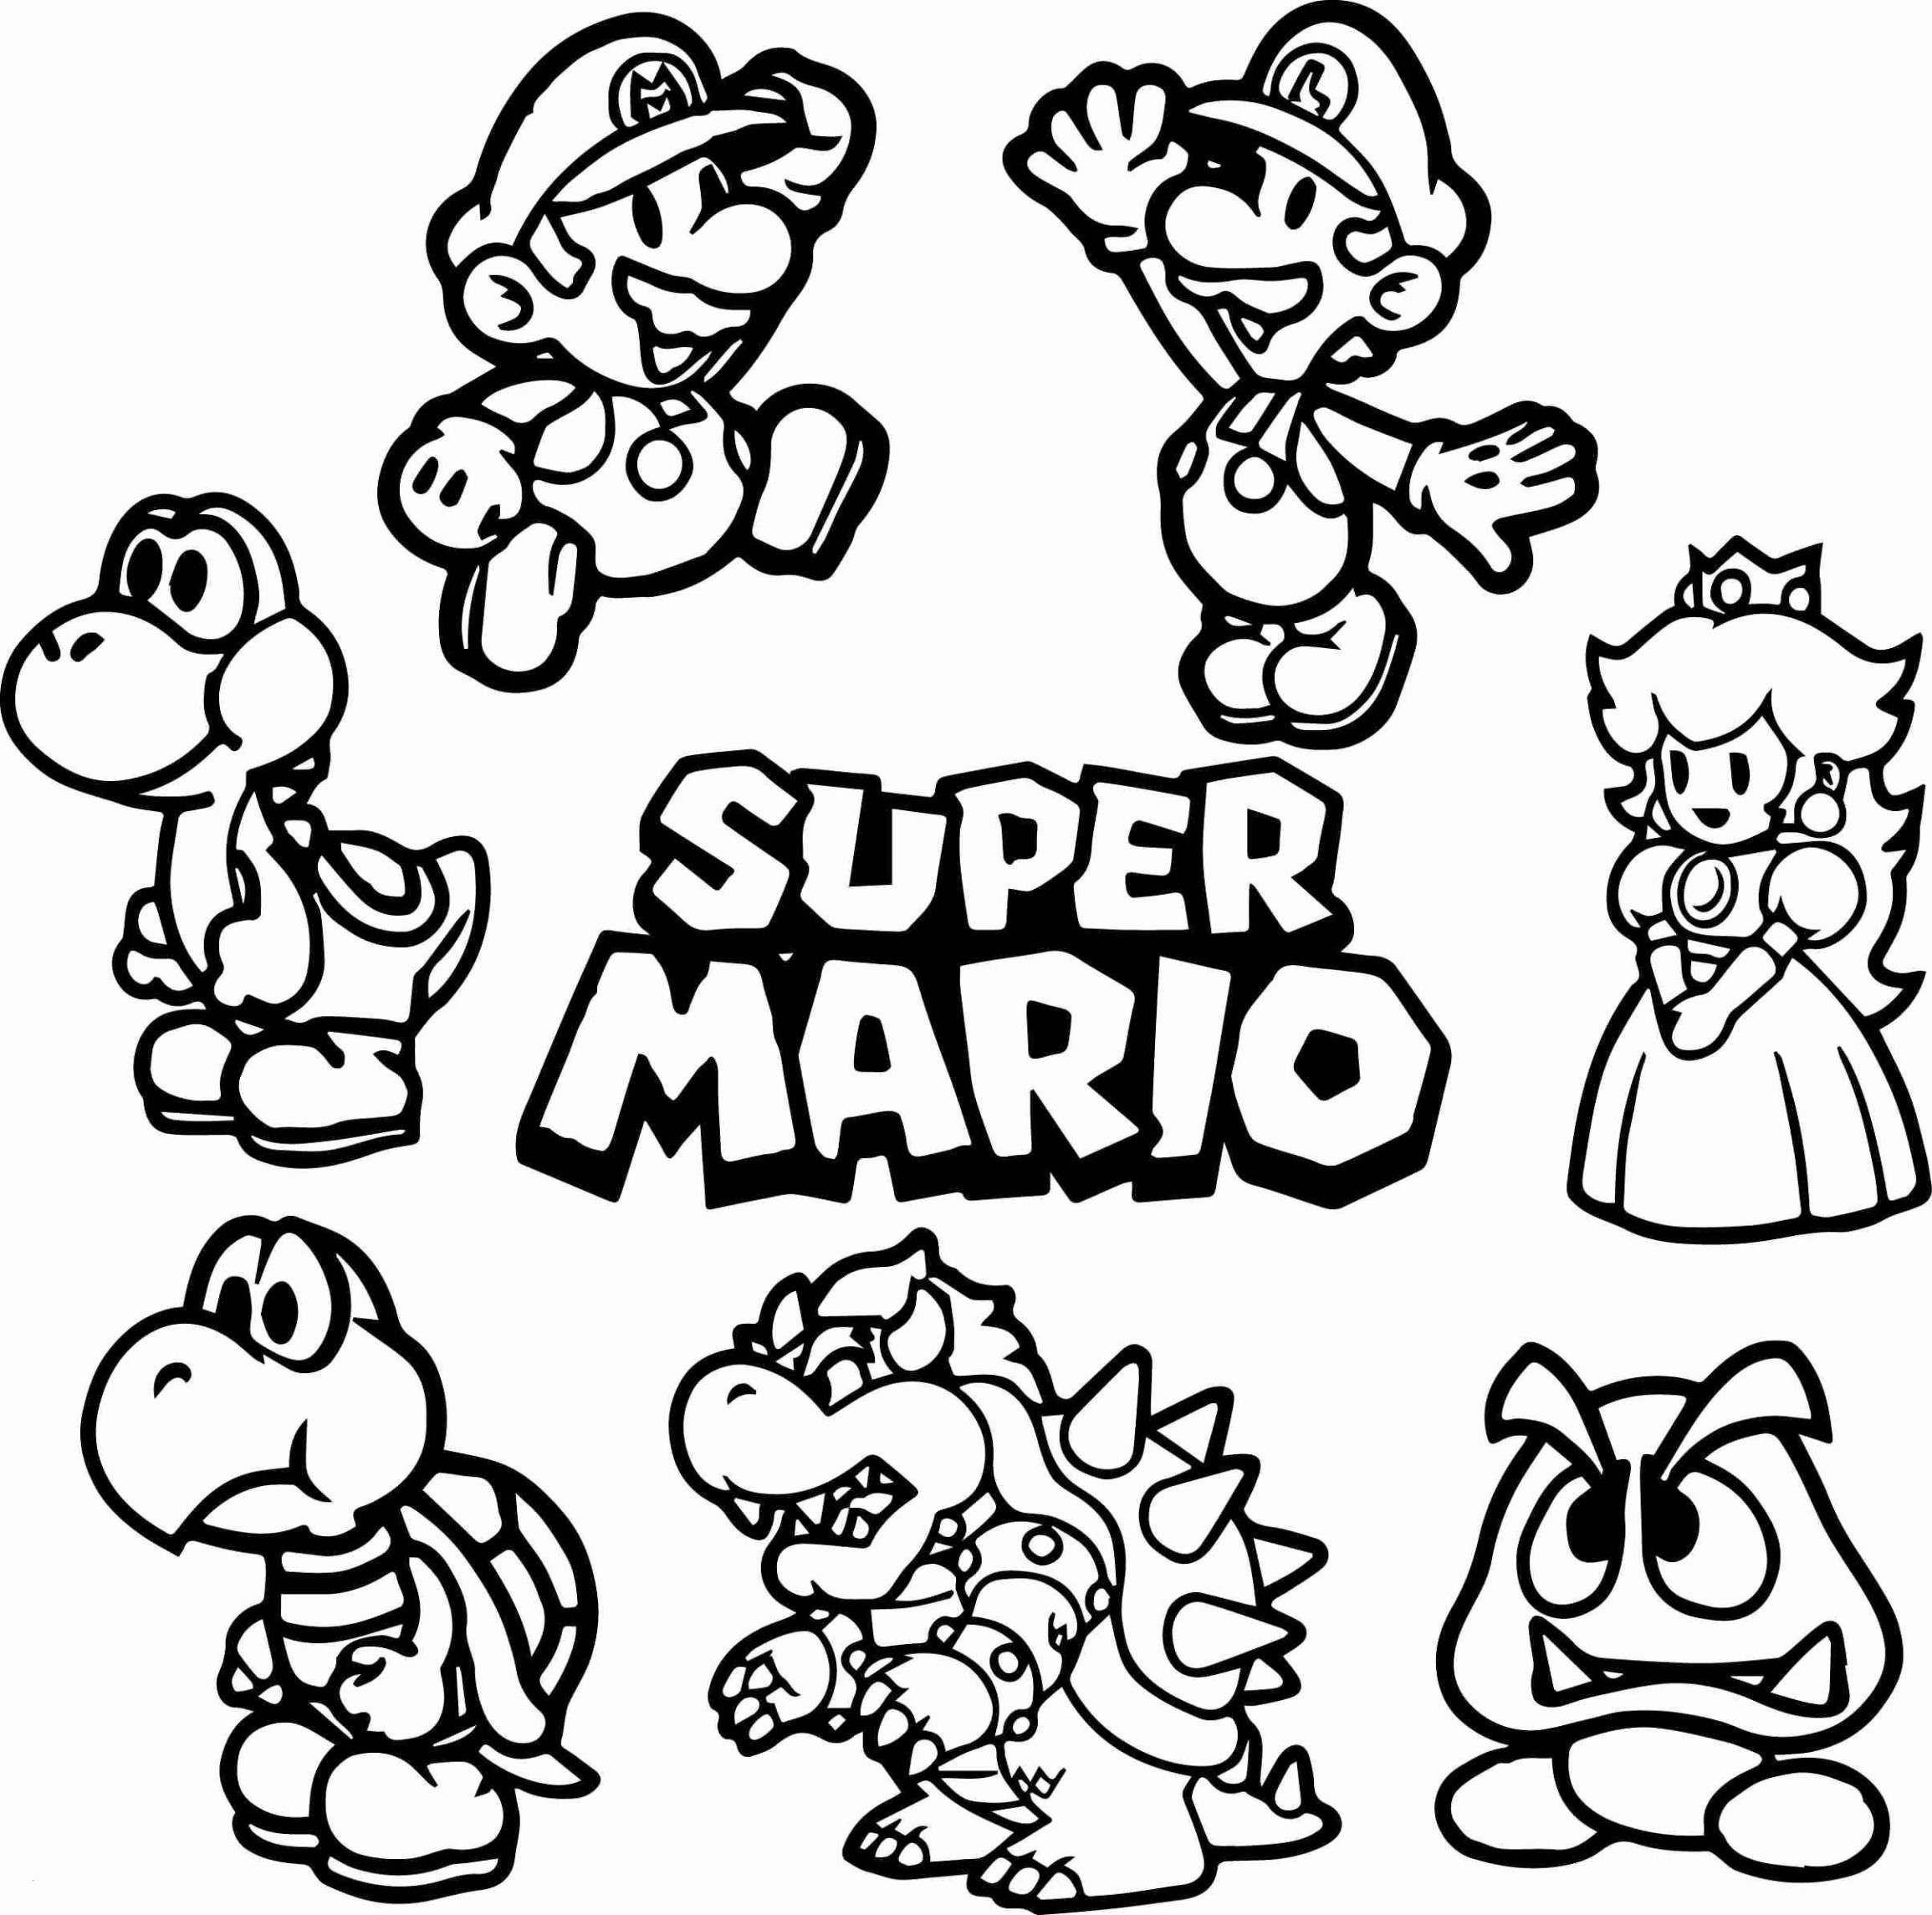 Pin By Olga Idiazabal On Draw Super Mario Coloring Pages Mario Coloring Pages Super Coloring Pages